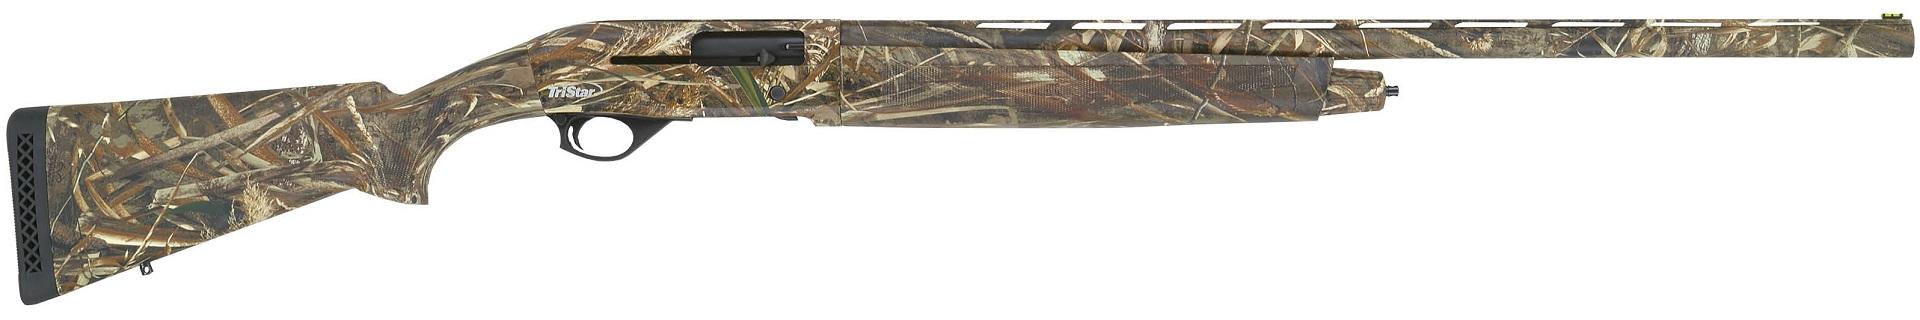 TriStar Sporting Arms VIPER G2 CAMO 12 GAUGE